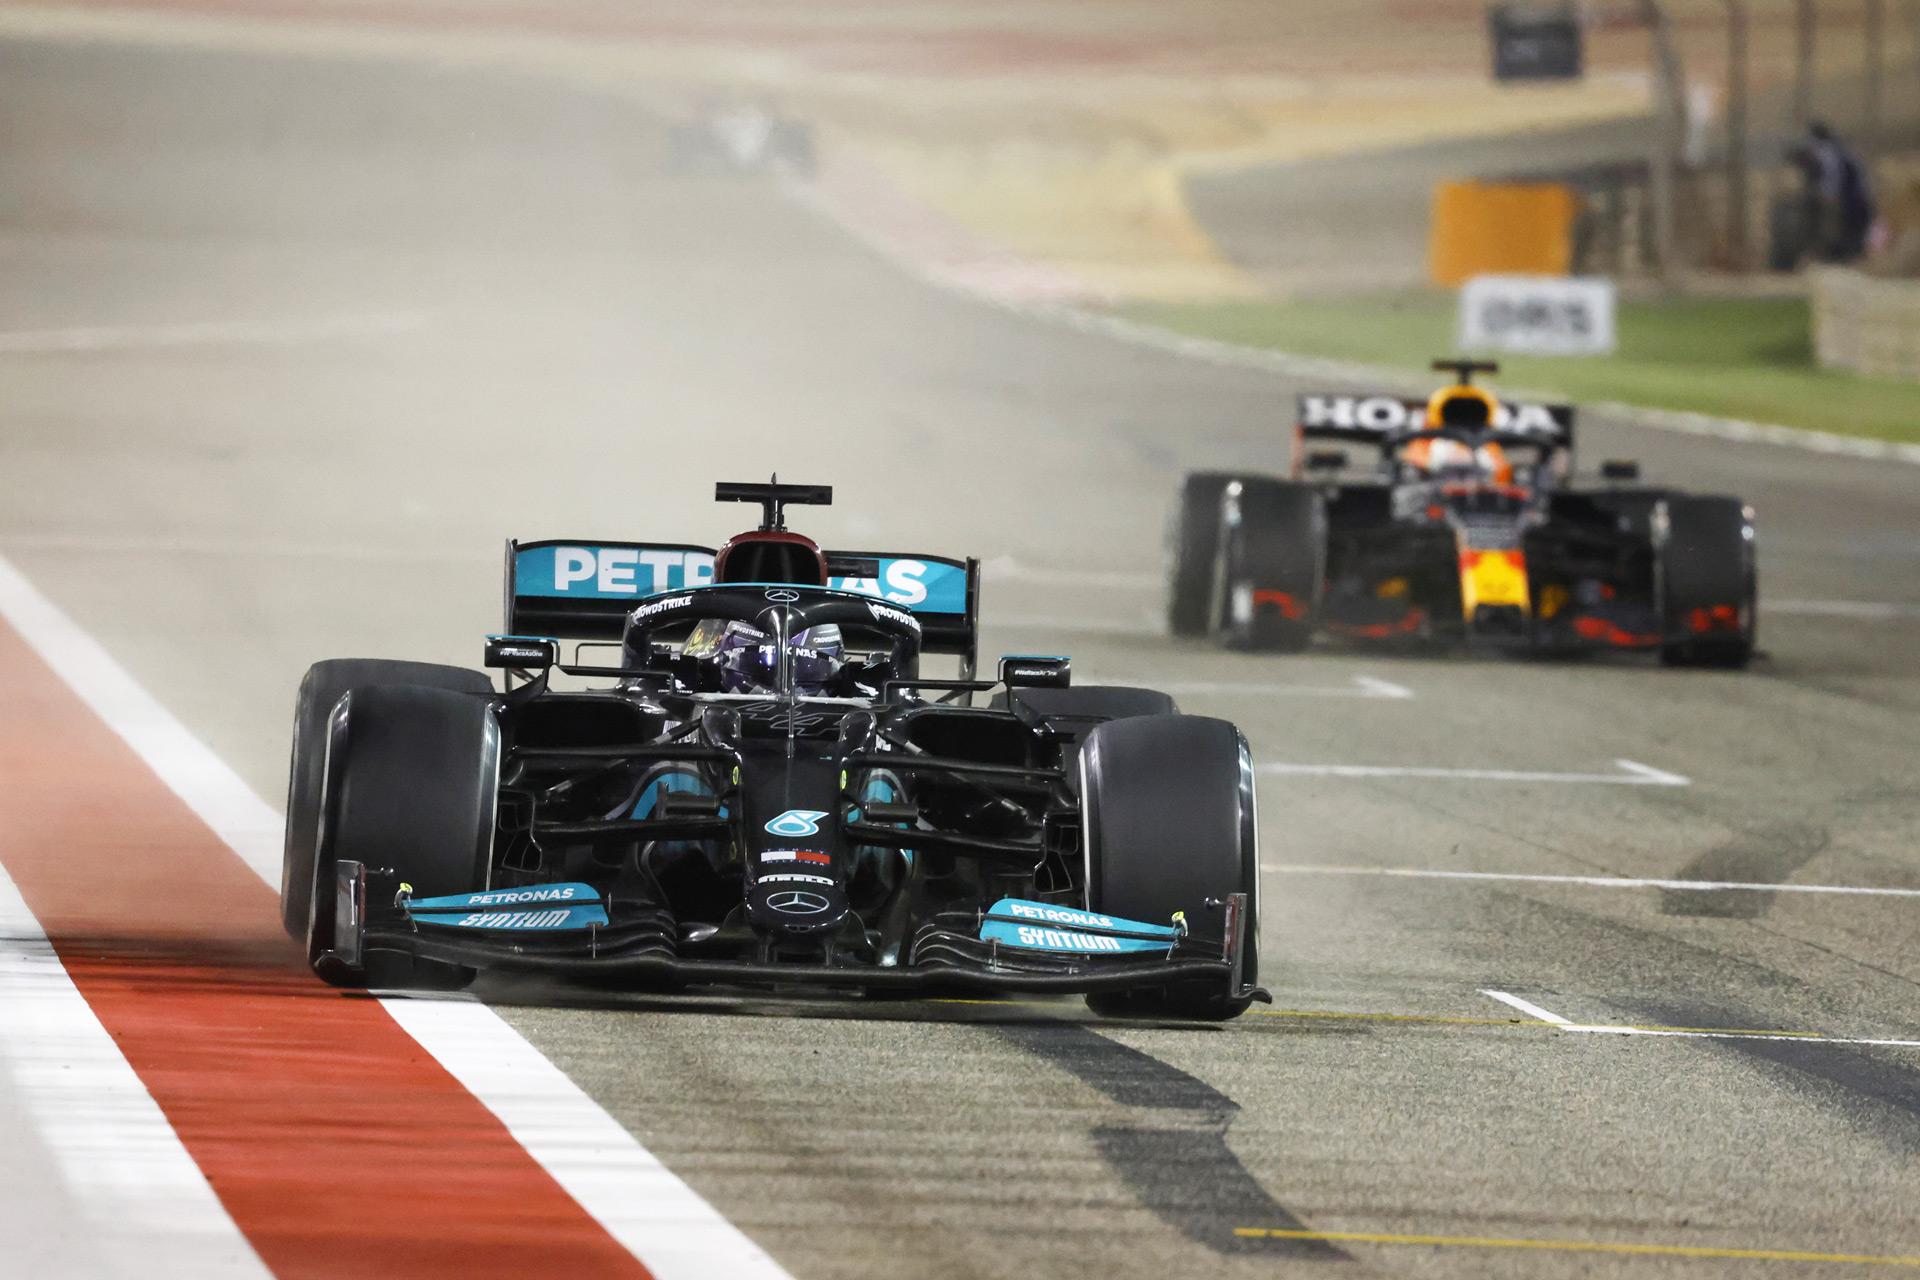 Hamilton edges out Verstappen for 2021 Bahrain Grand Prix win